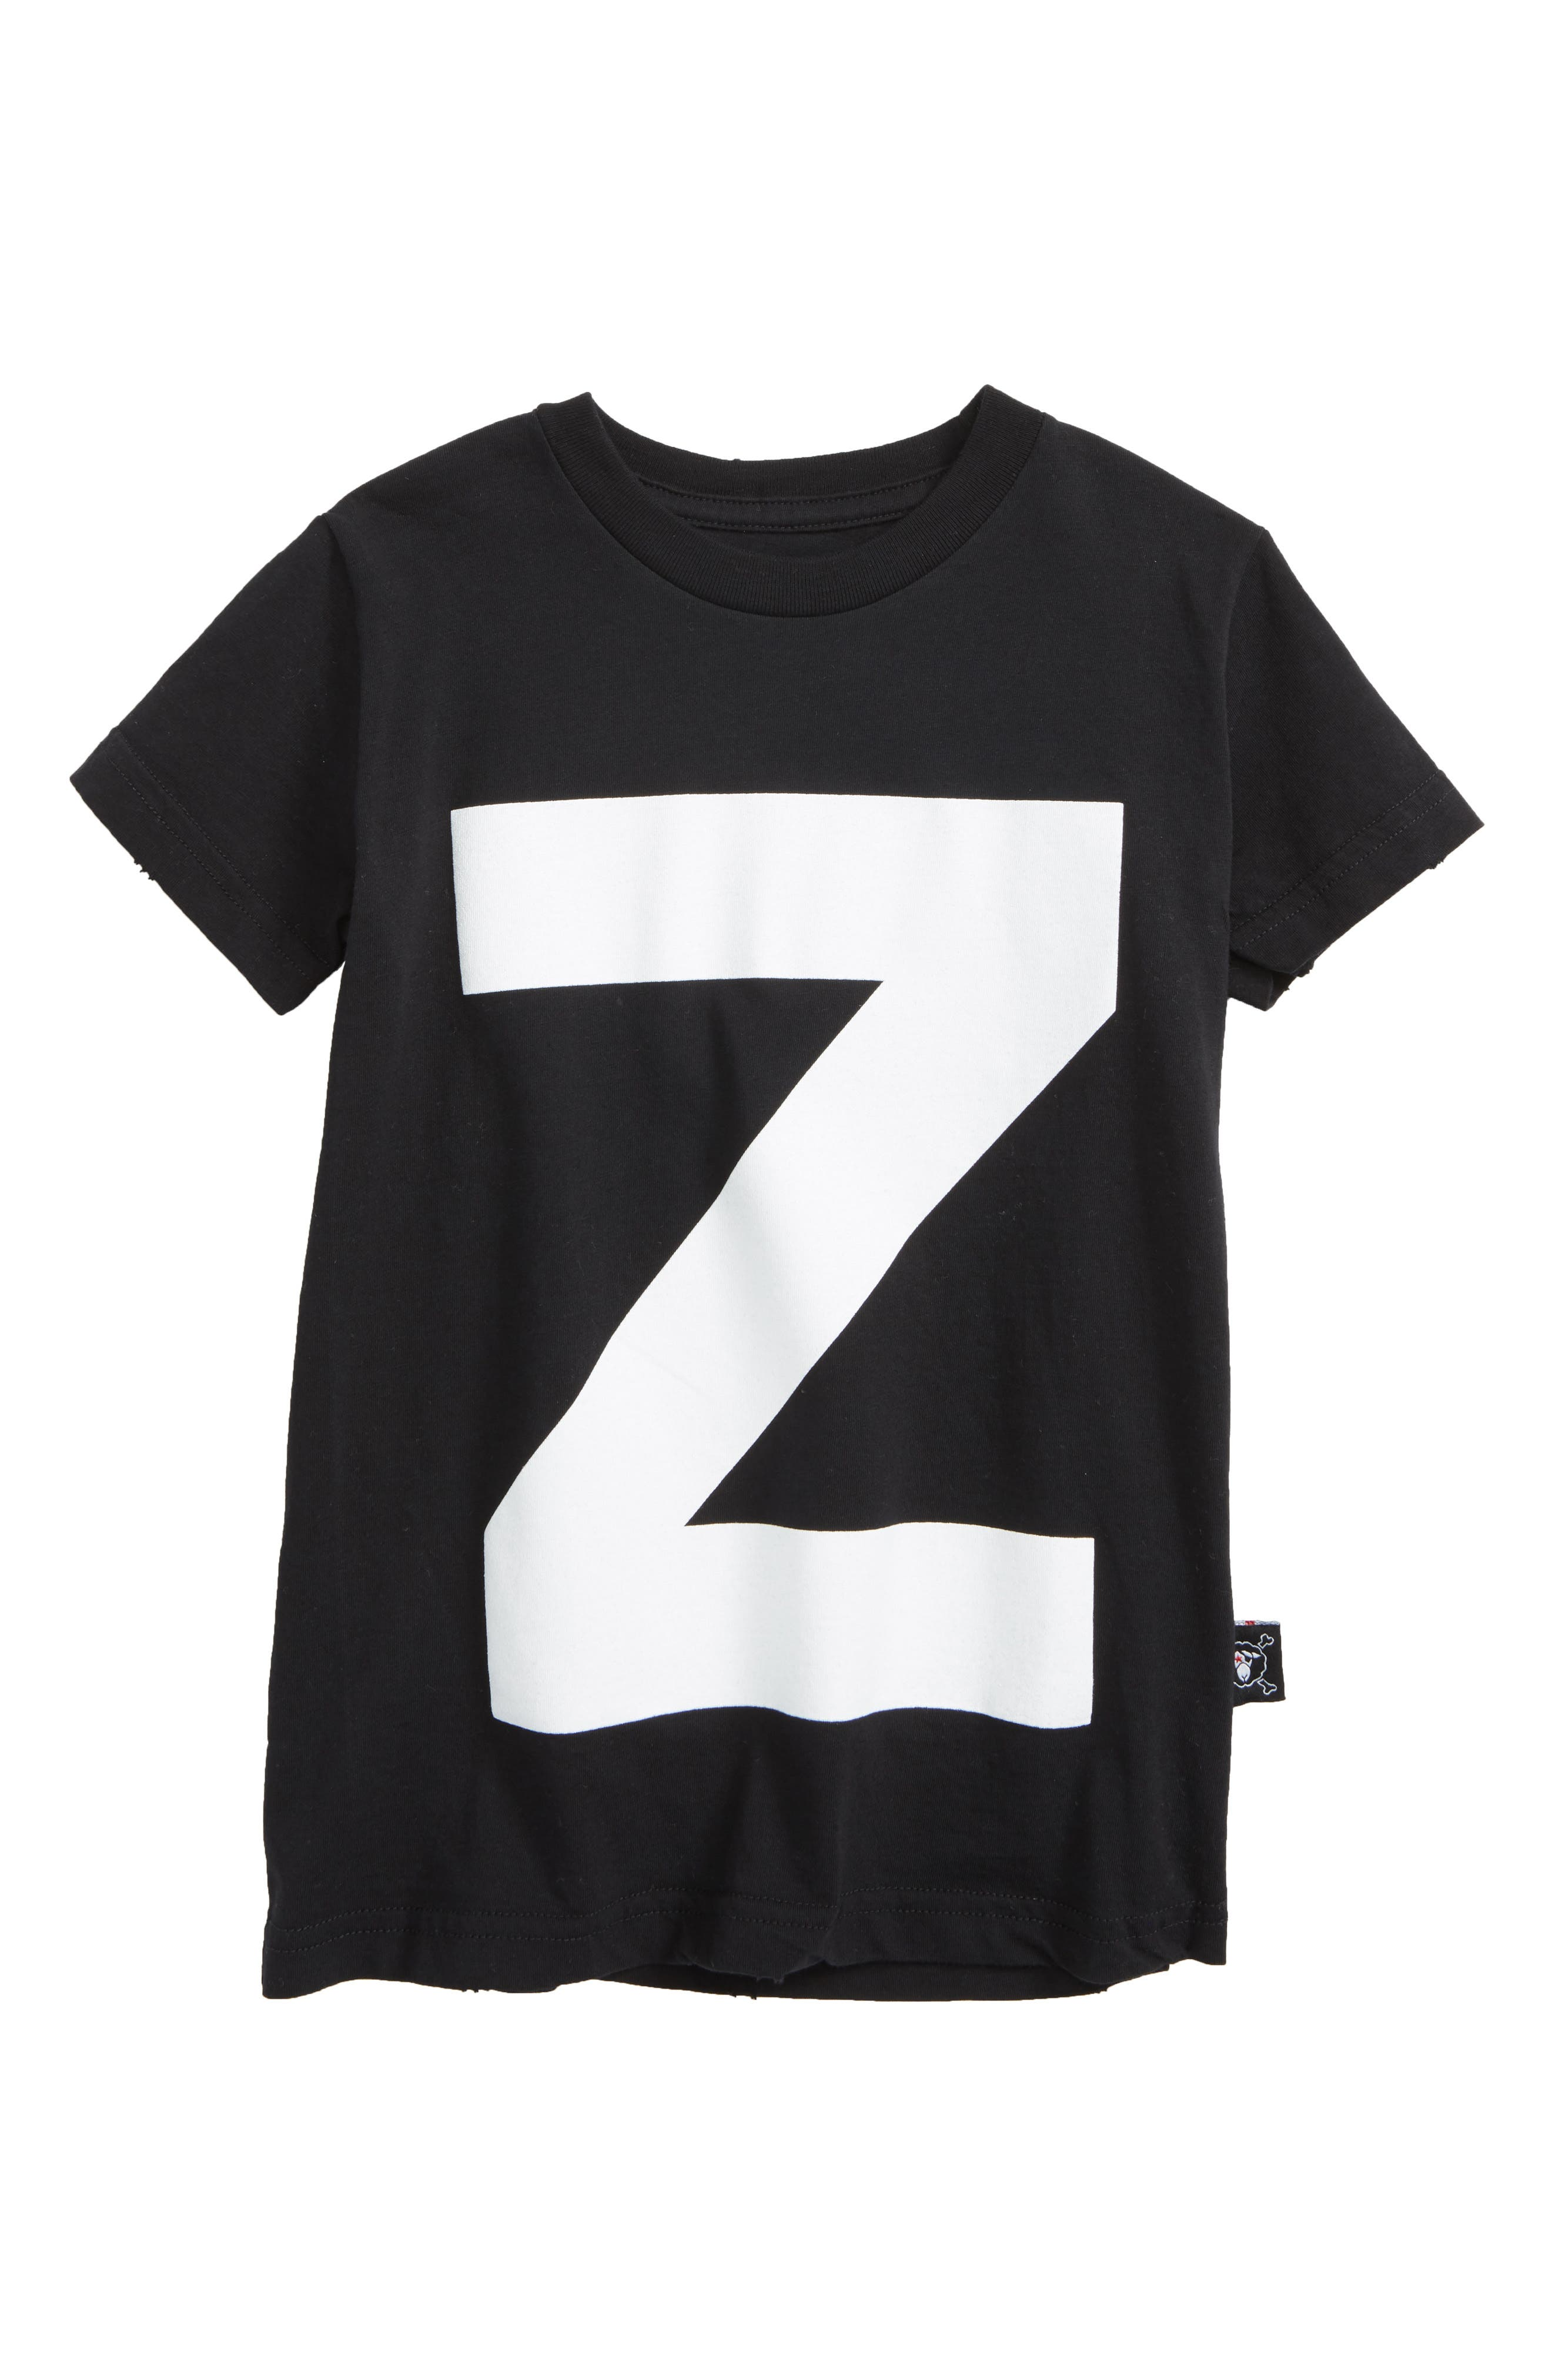 Z Graphic T-Shirt,                             Main thumbnail 1, color,                             Black